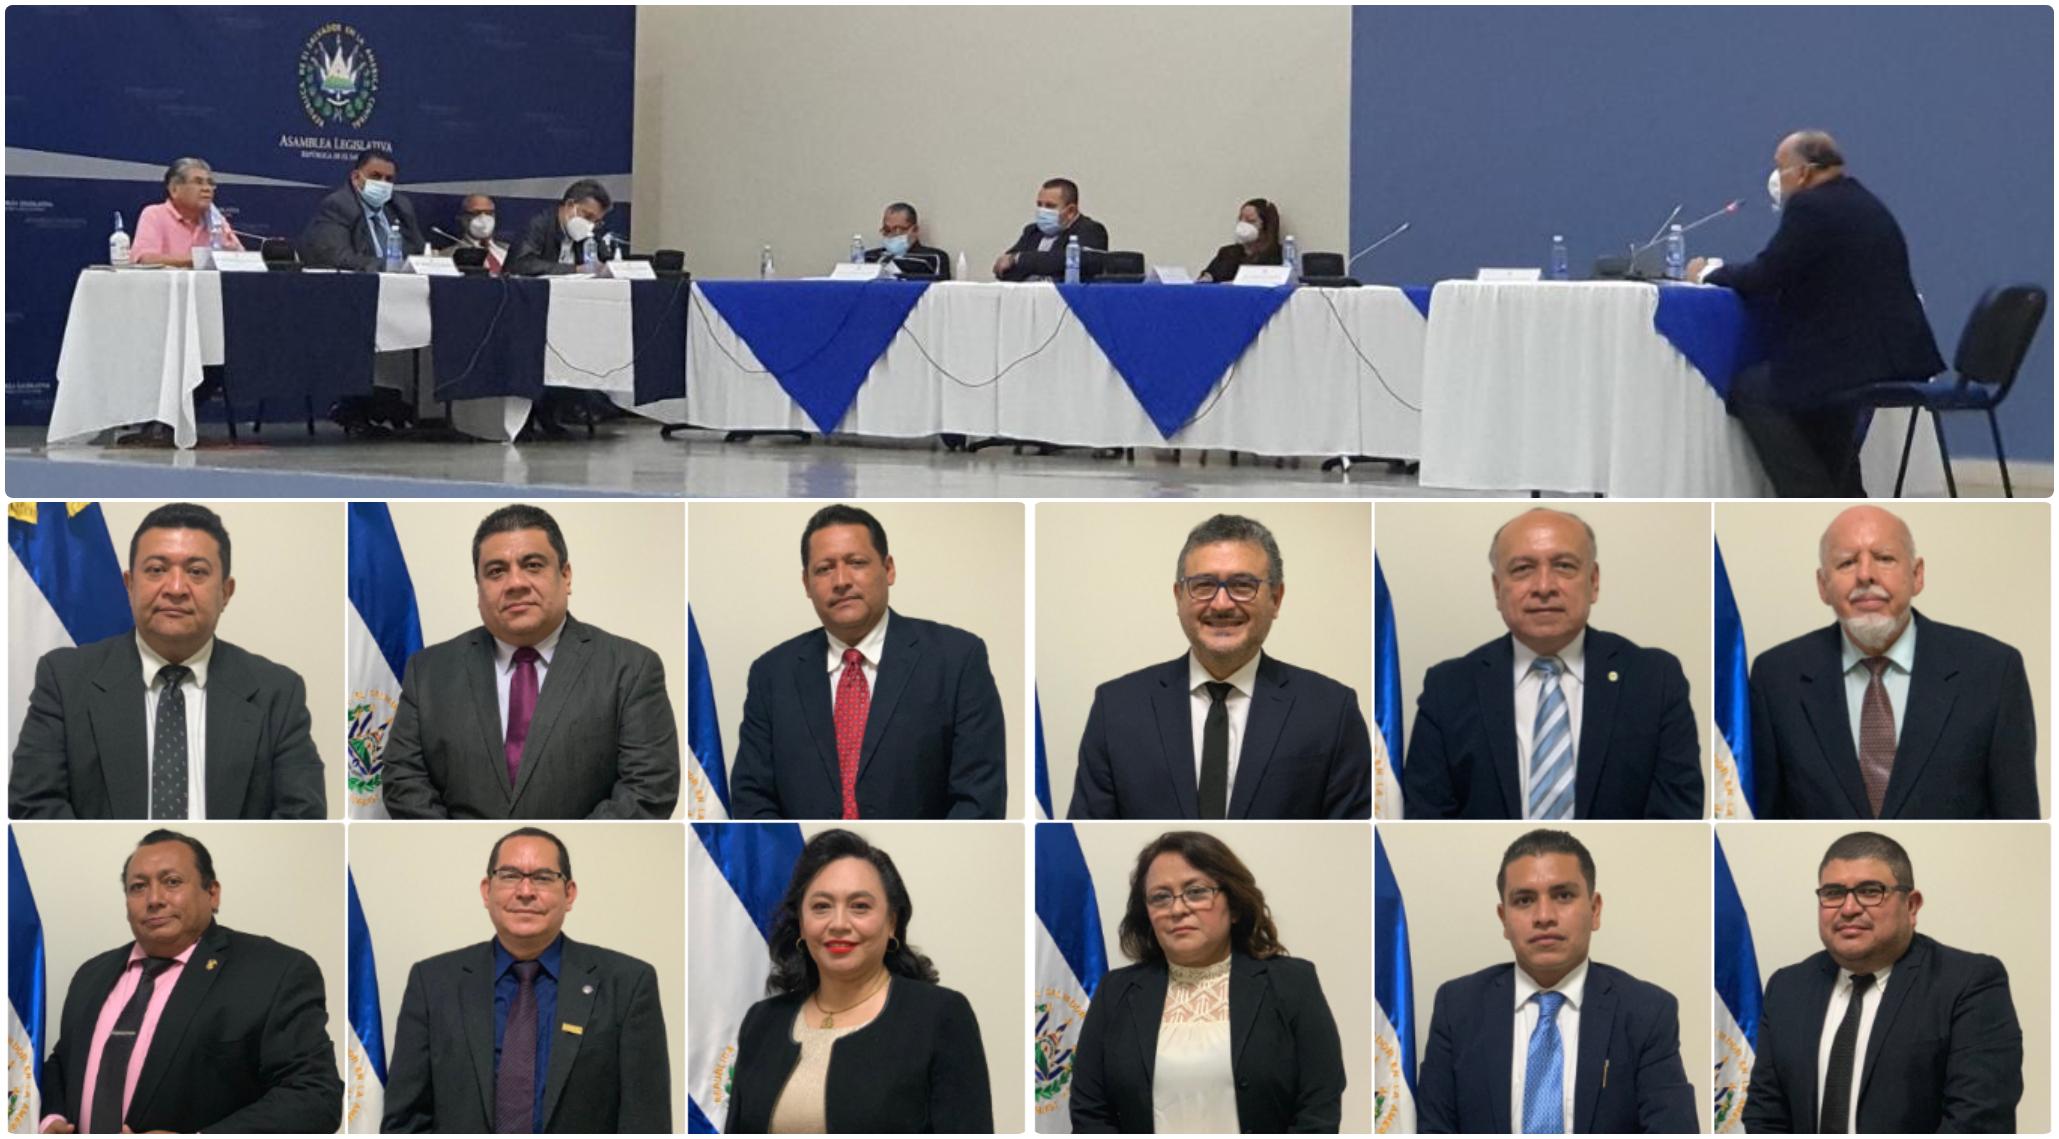 Diputados han entrevistado a 58 aspirantes a magistrados a CCR e invitan a la sociedad civil a ser parte del proceso